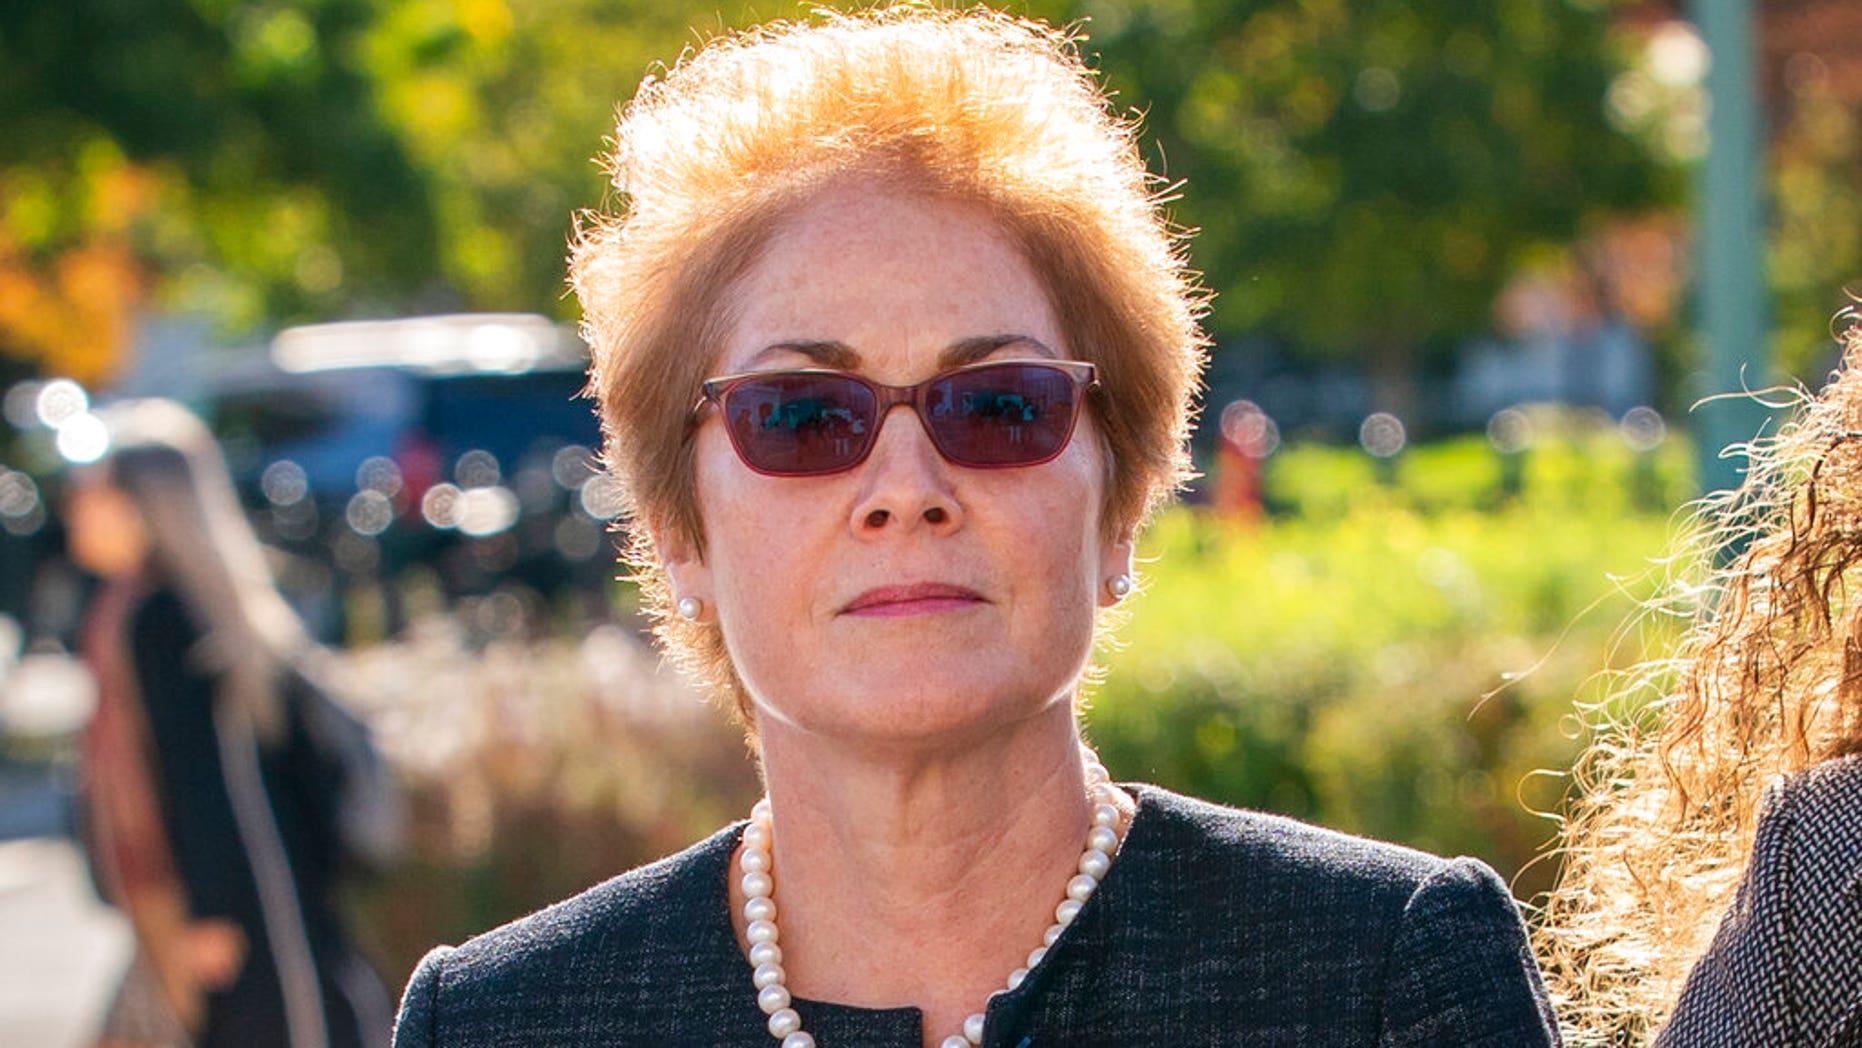 FILE - In this Oct. 11, 2019, file photo, former U.S. ambassador to Ukraine Marie Yovanovitch, arrives on Capitol Hill in Washington. (AP Photo/J. Scott Applewhite, File)